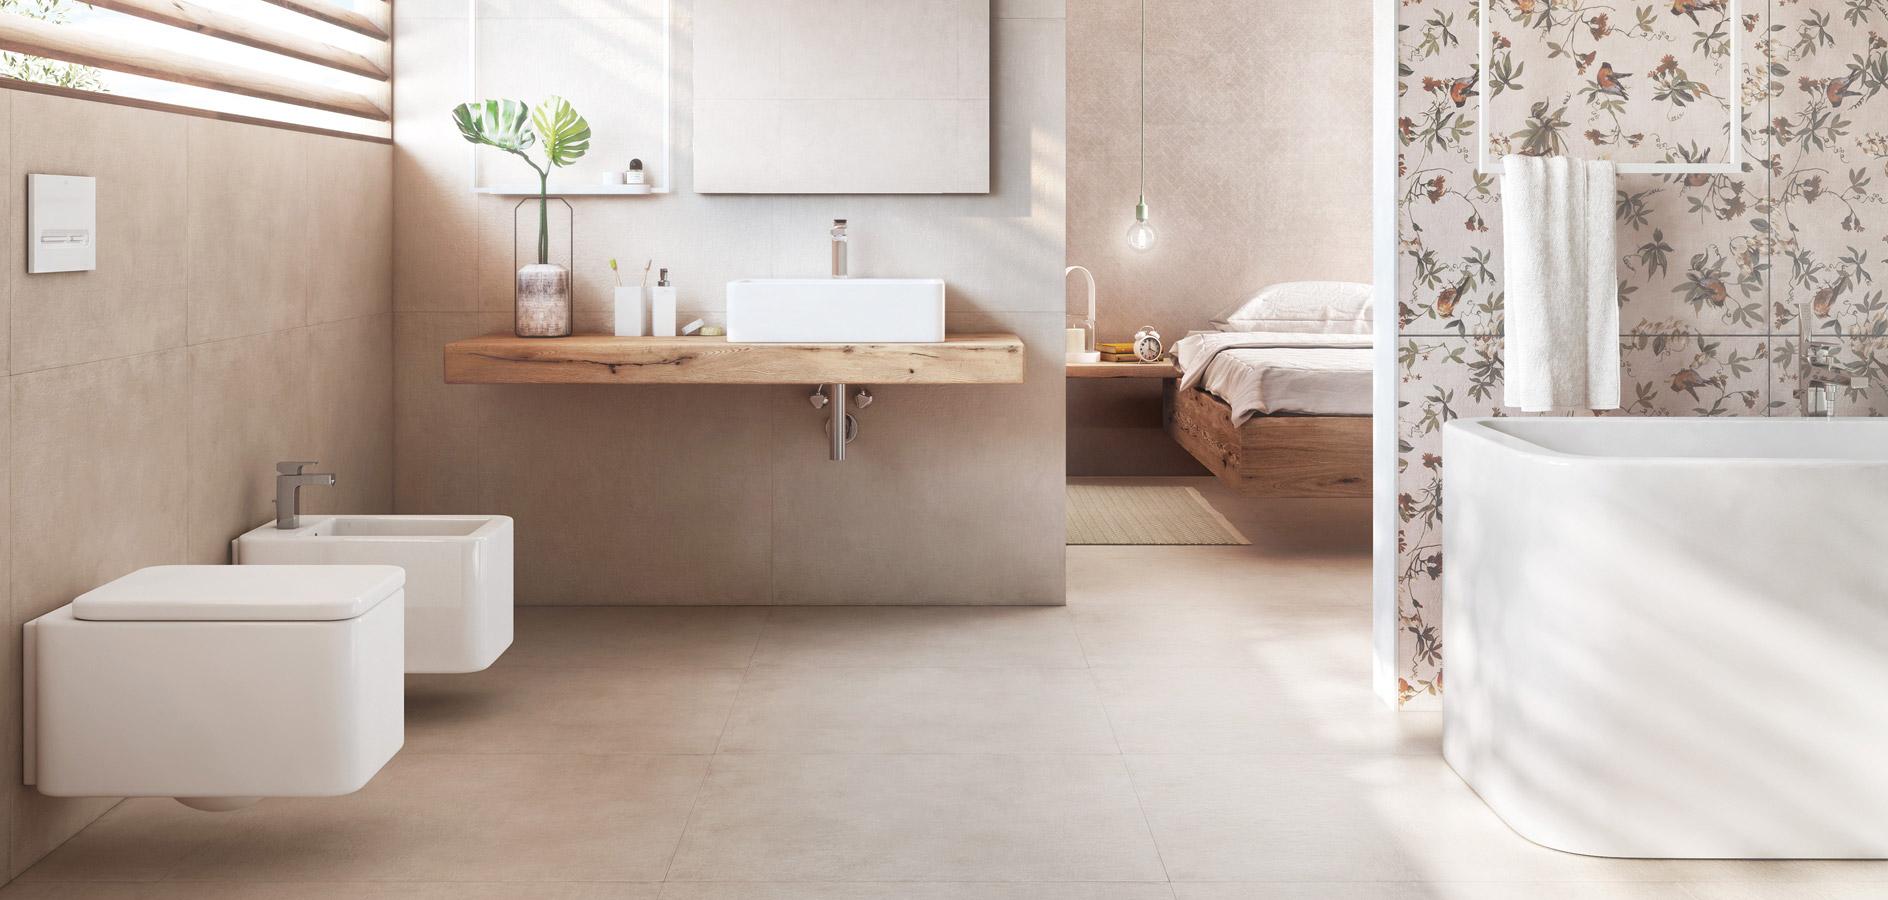 Ideas For A Minimalist Bathroom